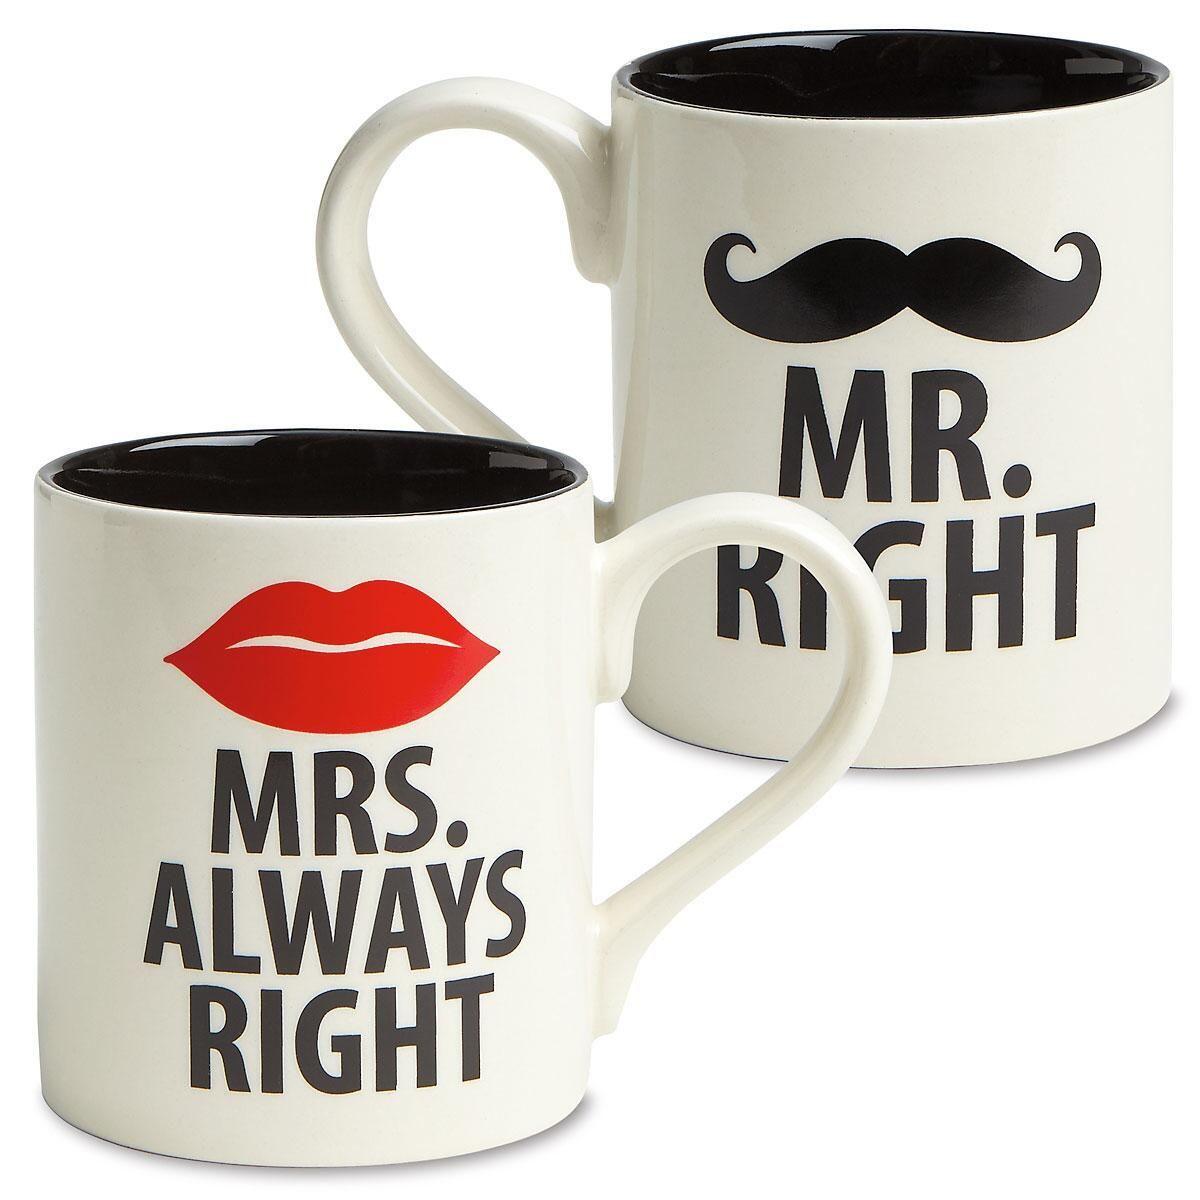 Mr. & Mrs. Right Mugs